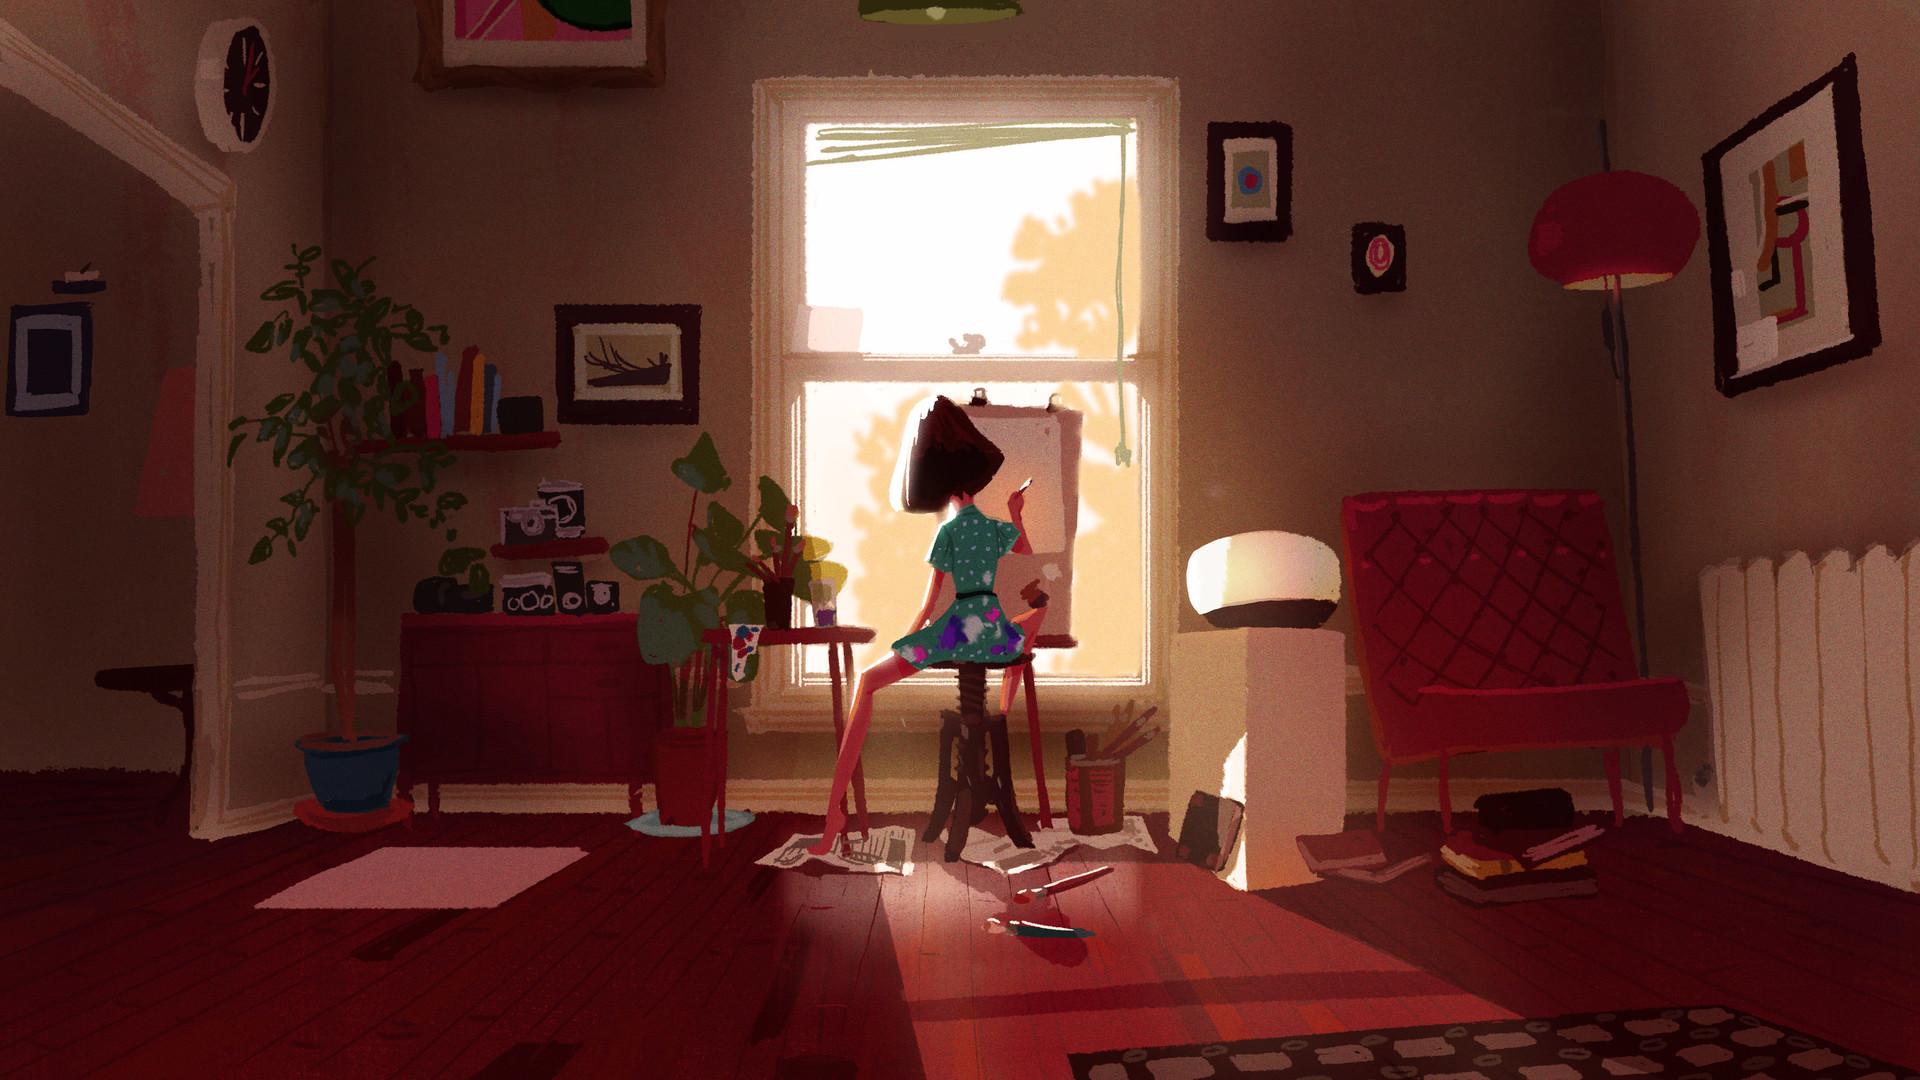 ArtStation - Living Room Studio, Mike Redman